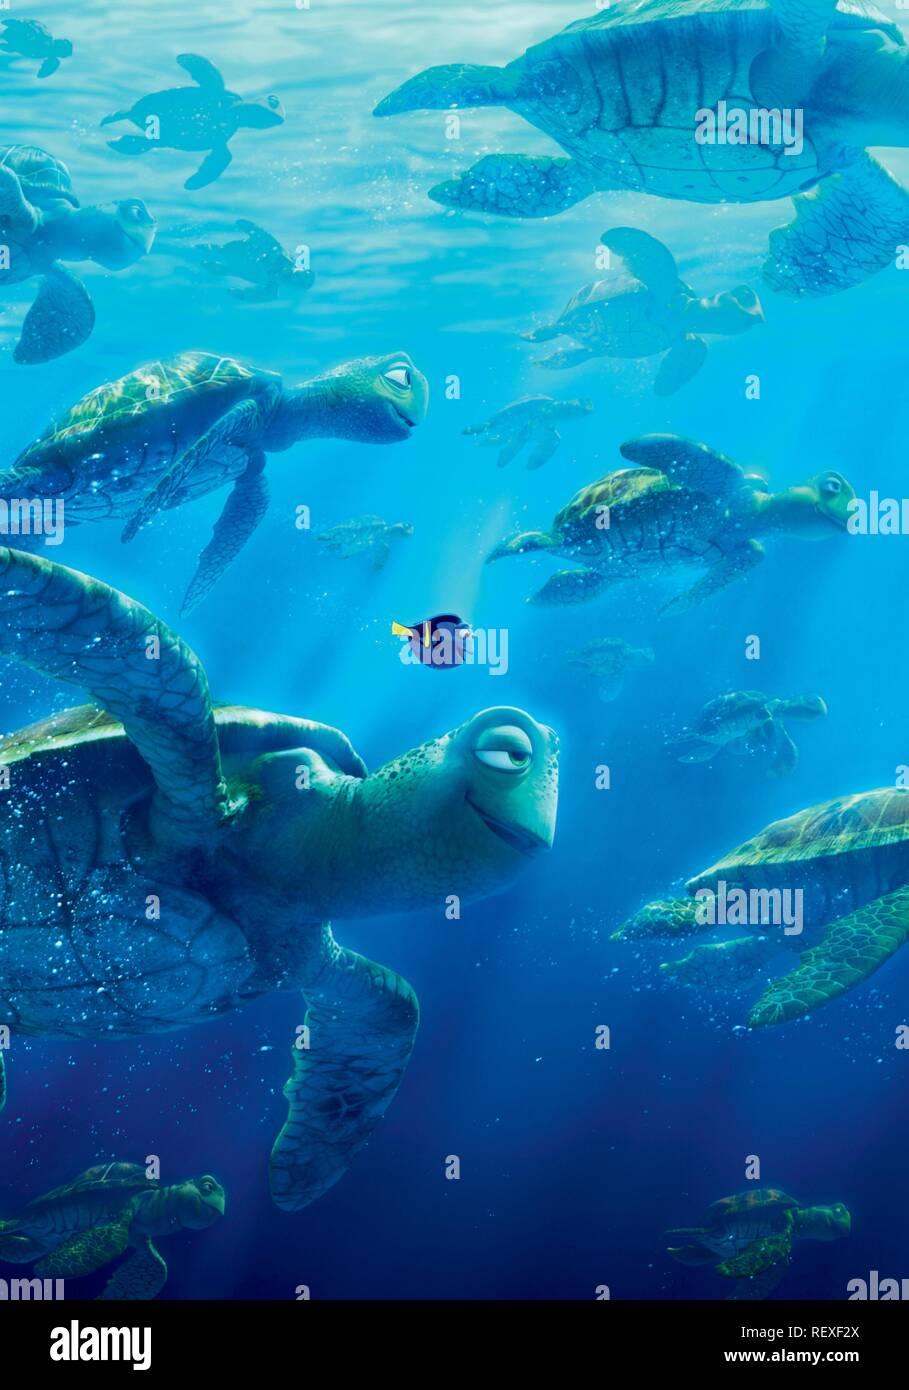 Dory Crush Finding Dory 2016 Stock Photo Alamy